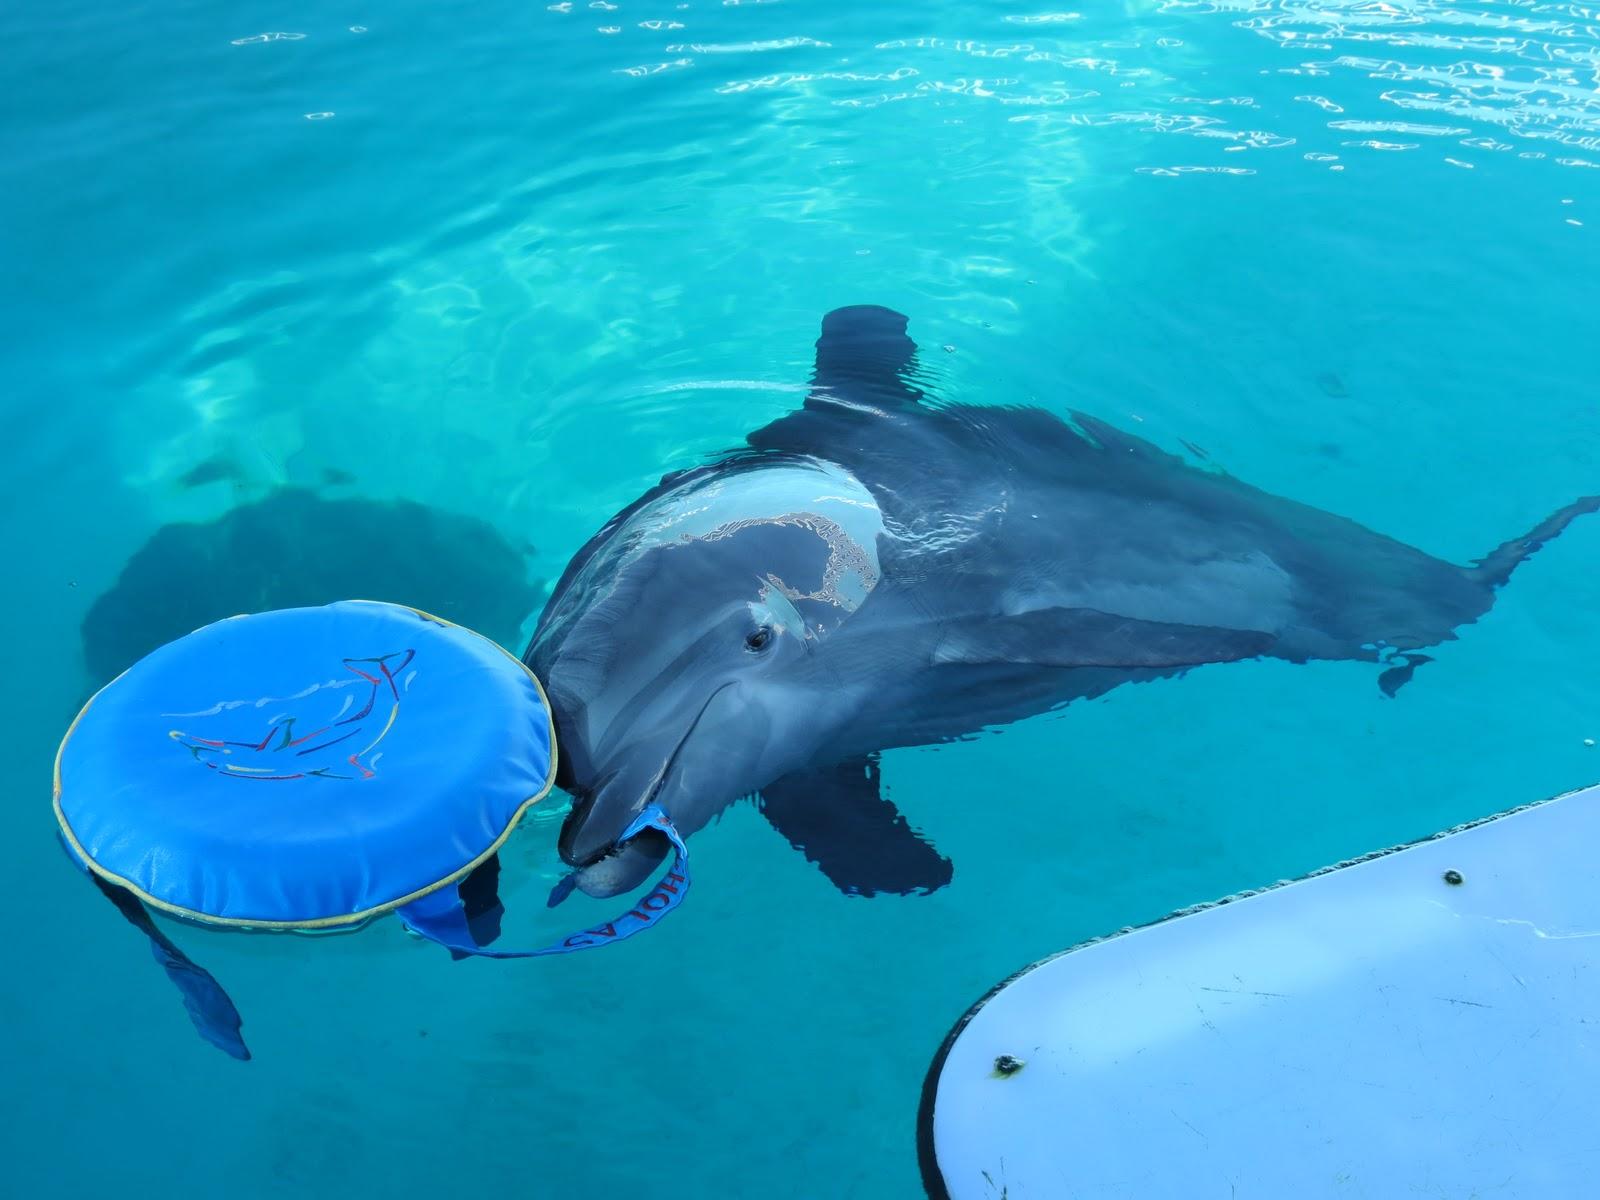 Cerebral Palsy Family Clearwater Marine Aquarium